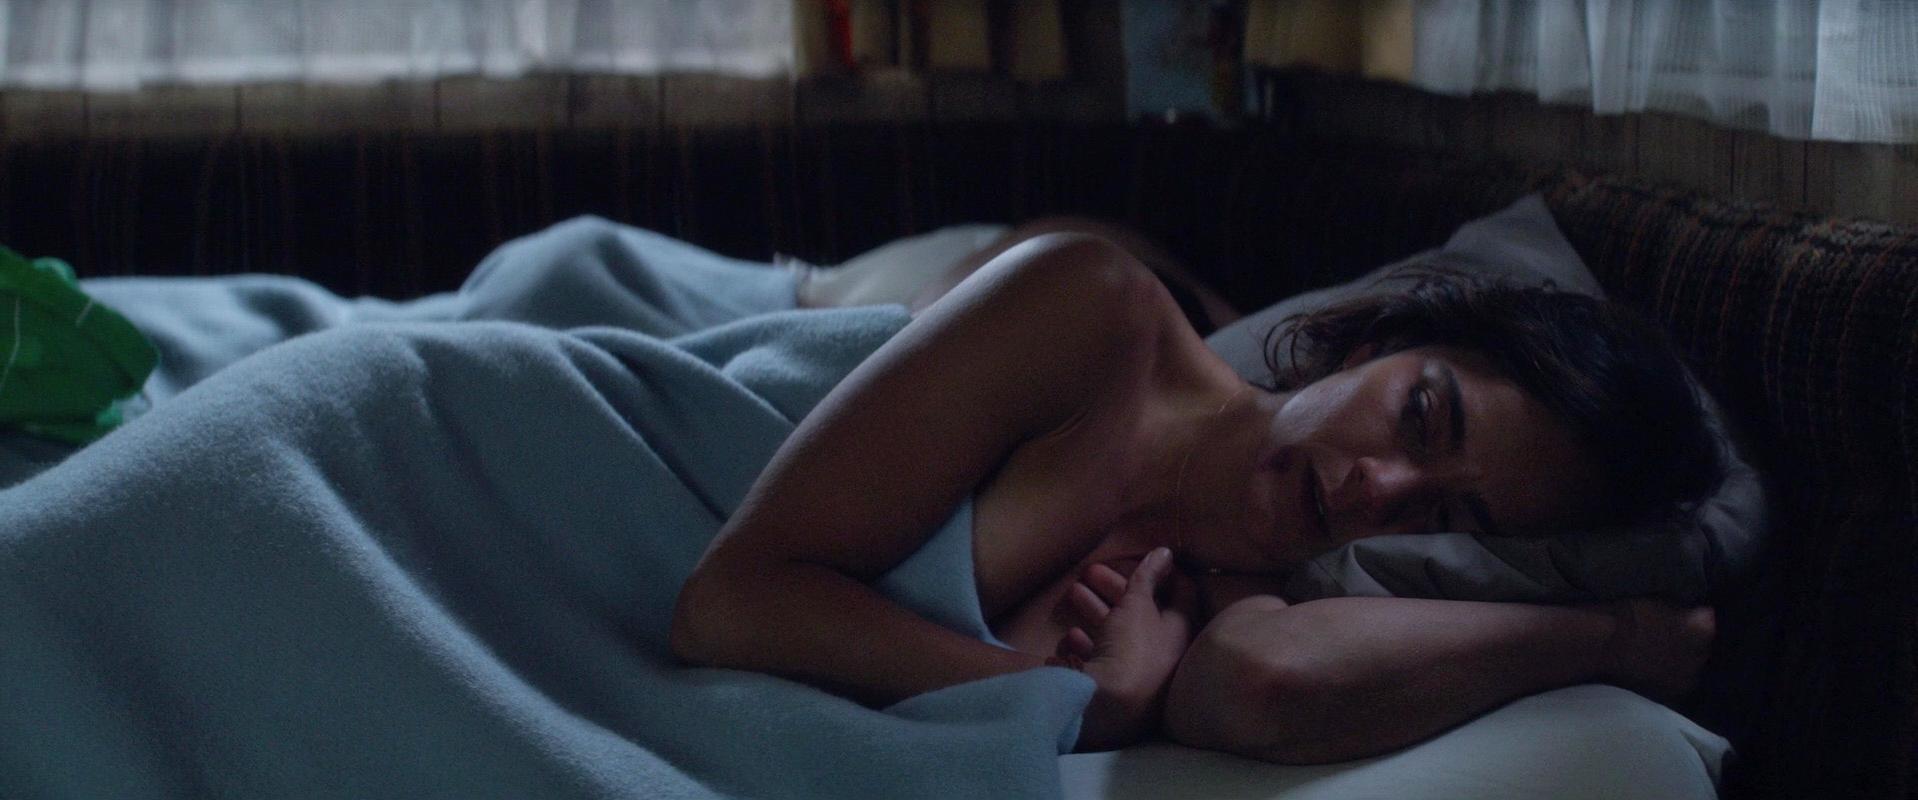 Alice underwearga nude, Teresa Palmer sexy - Kill Me Three Times (2014)